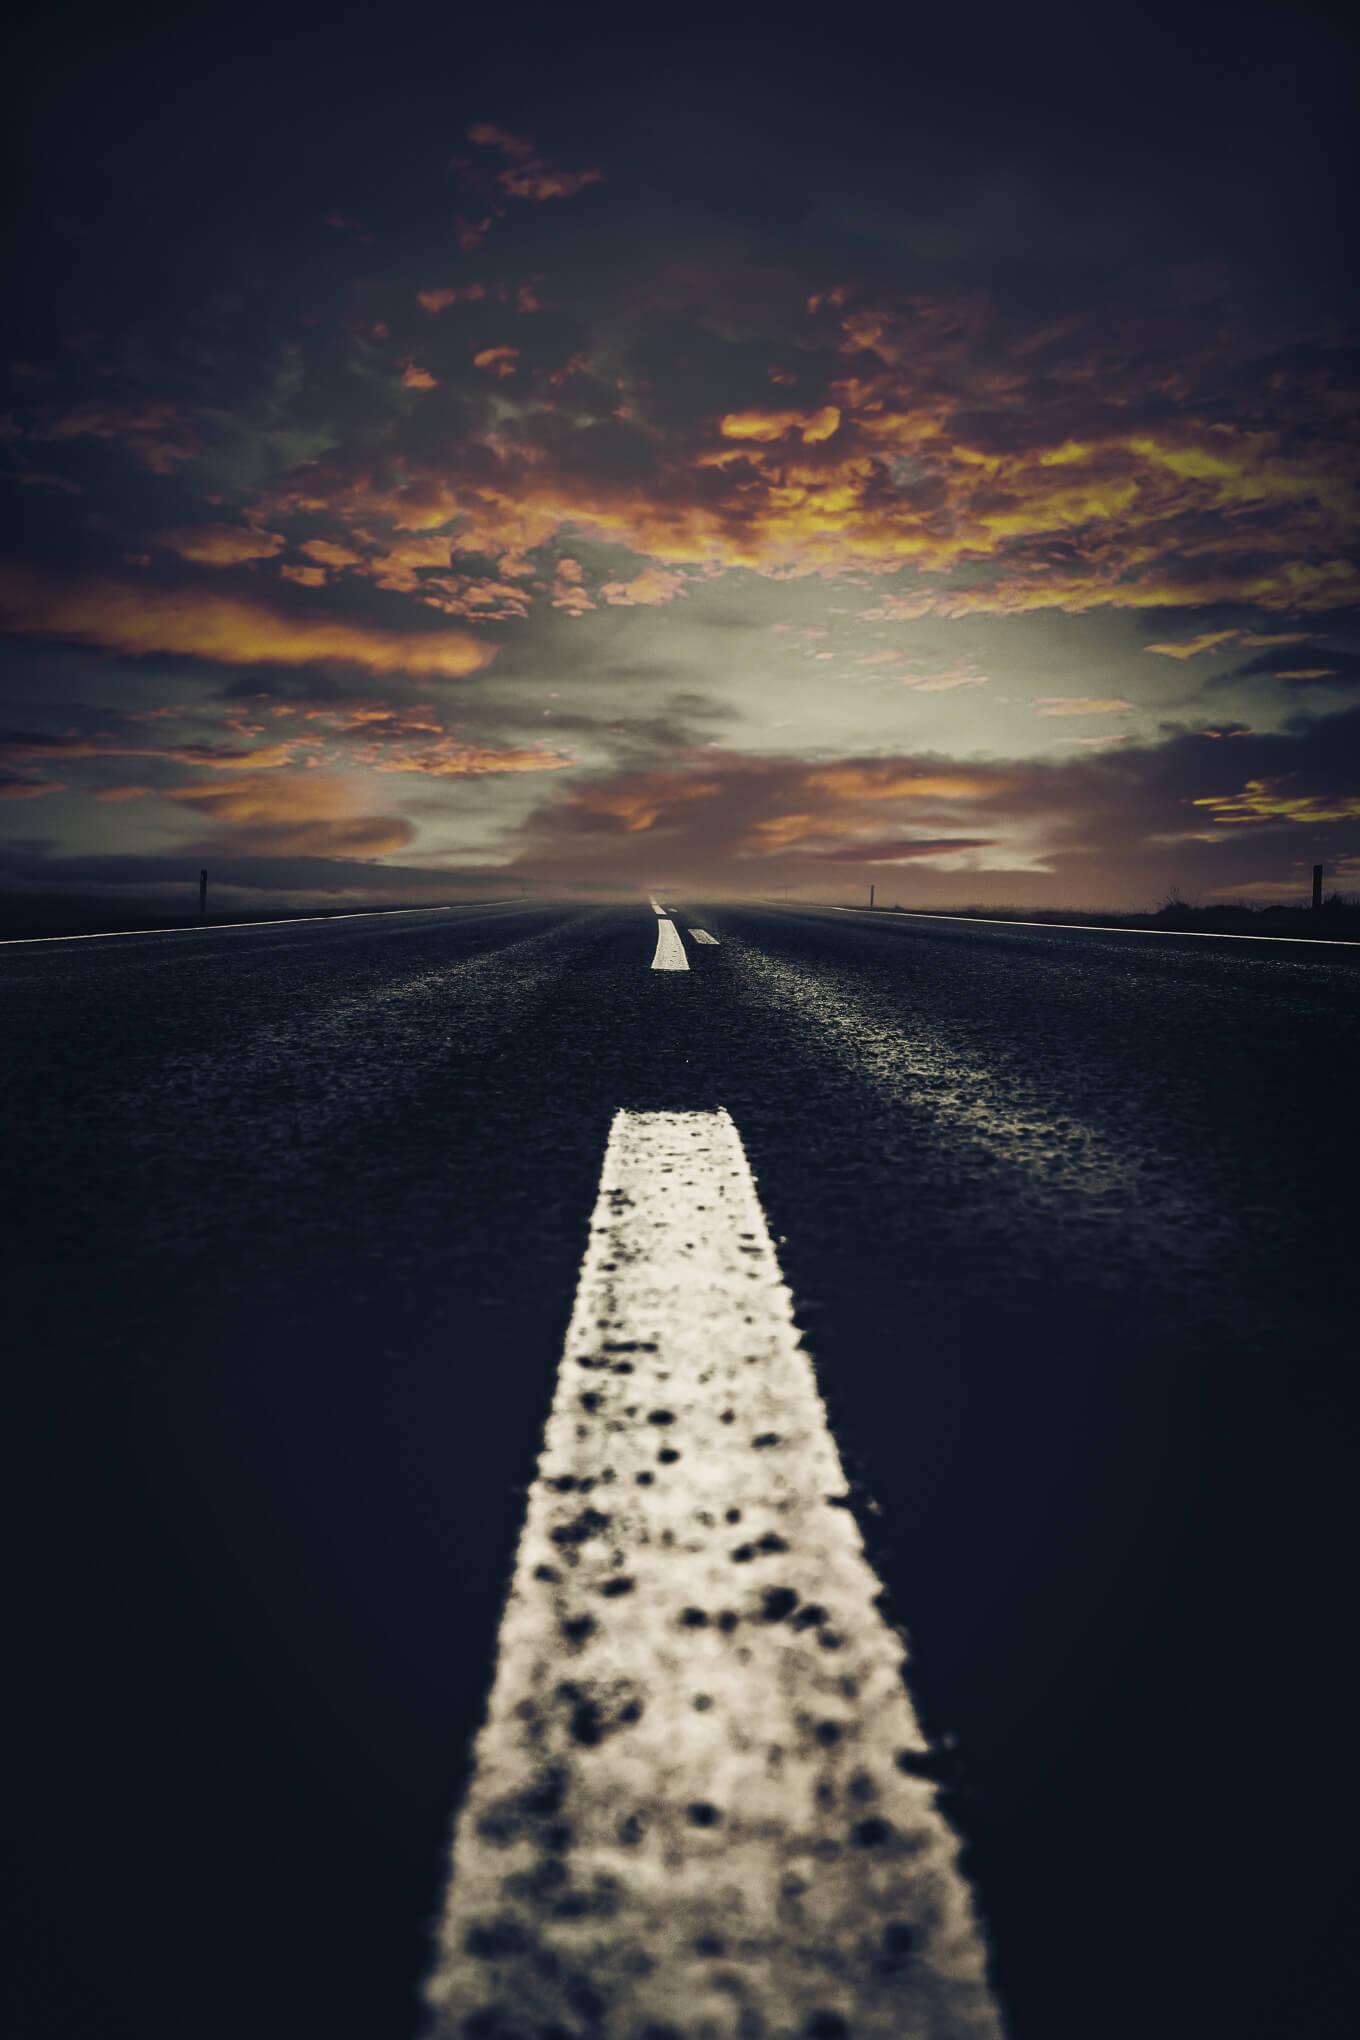 landscpae_paltenghi_claudio_photography12 🇫🇴Faroeisland Road Trip🇫🇴 Blog Landscape